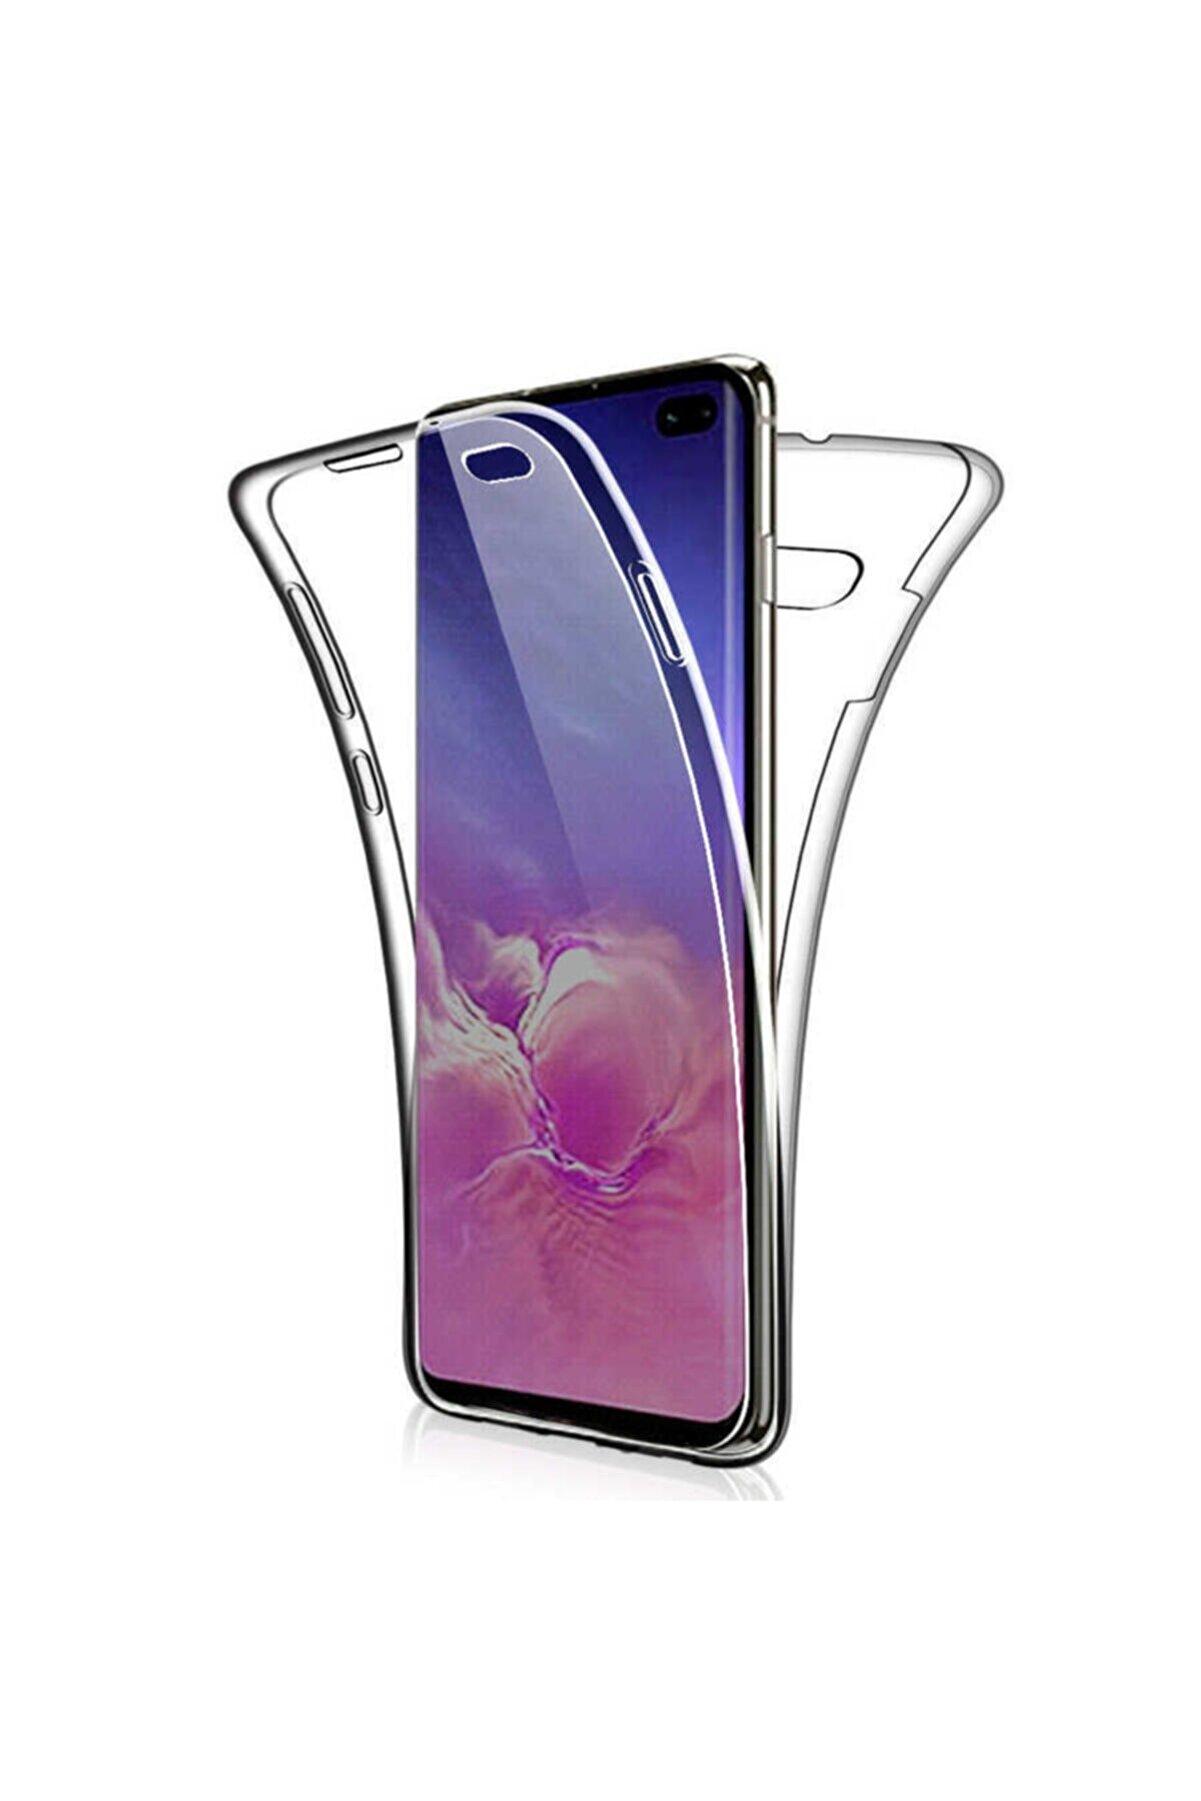 Samsung Galaxy S10e Uyumlu Kılıf 360 Derece Tam Koruma Şeffaf Yumuşak Silikon